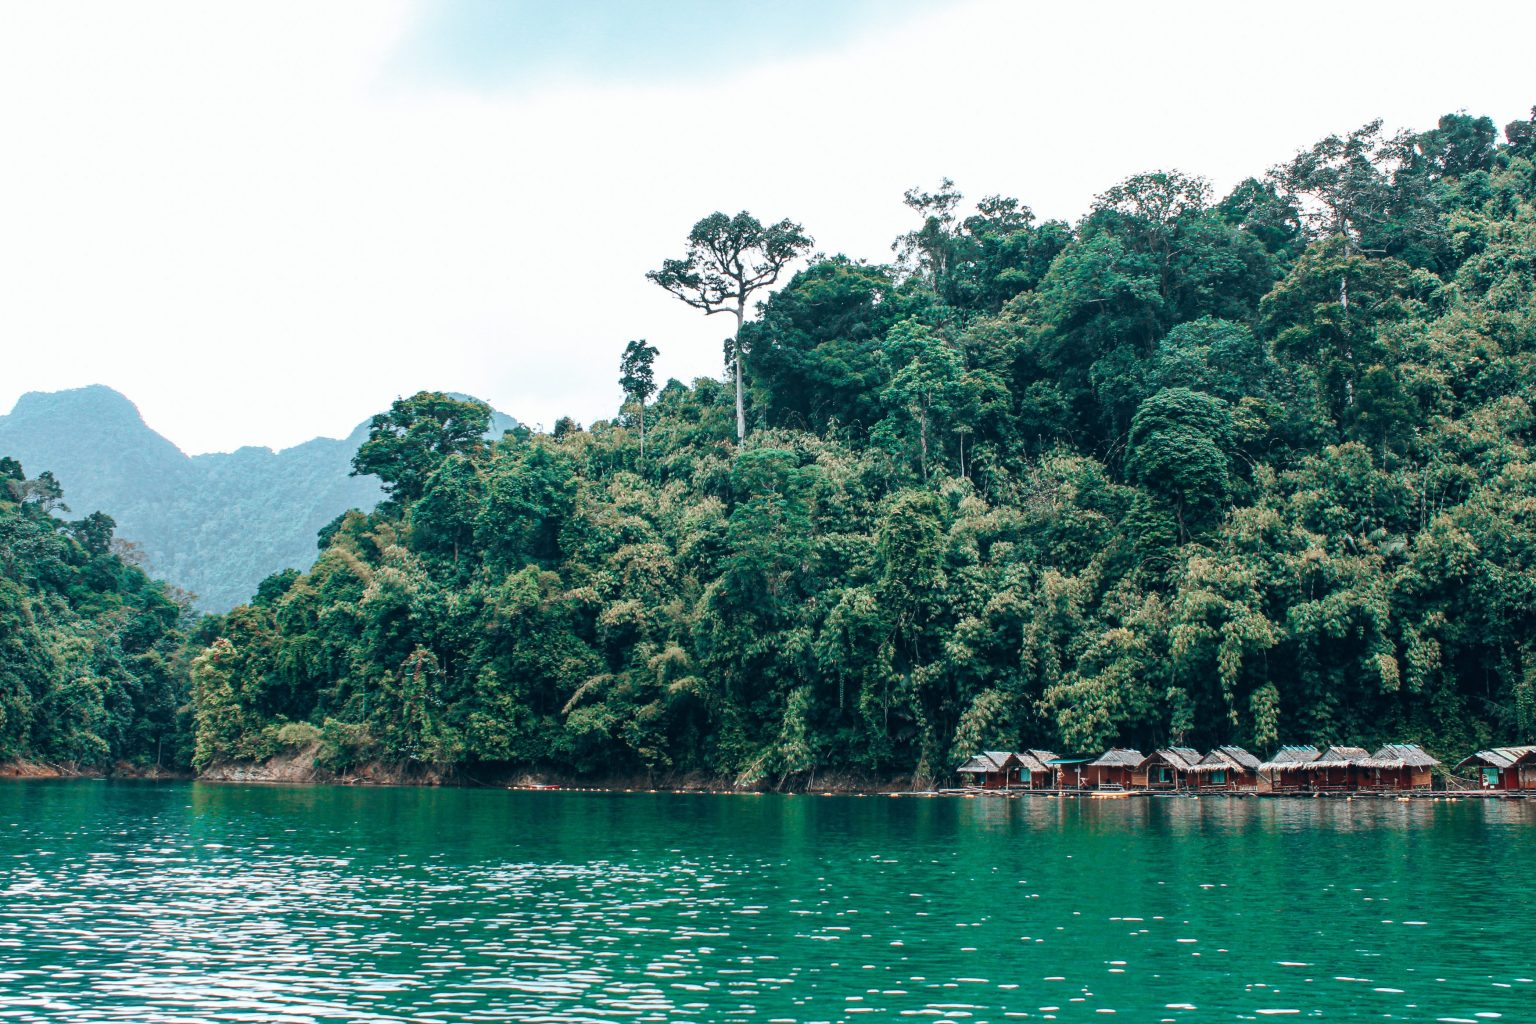 De mooiste bestemming in Thailand: Khao Sok National Park via @wereldreizigersnl